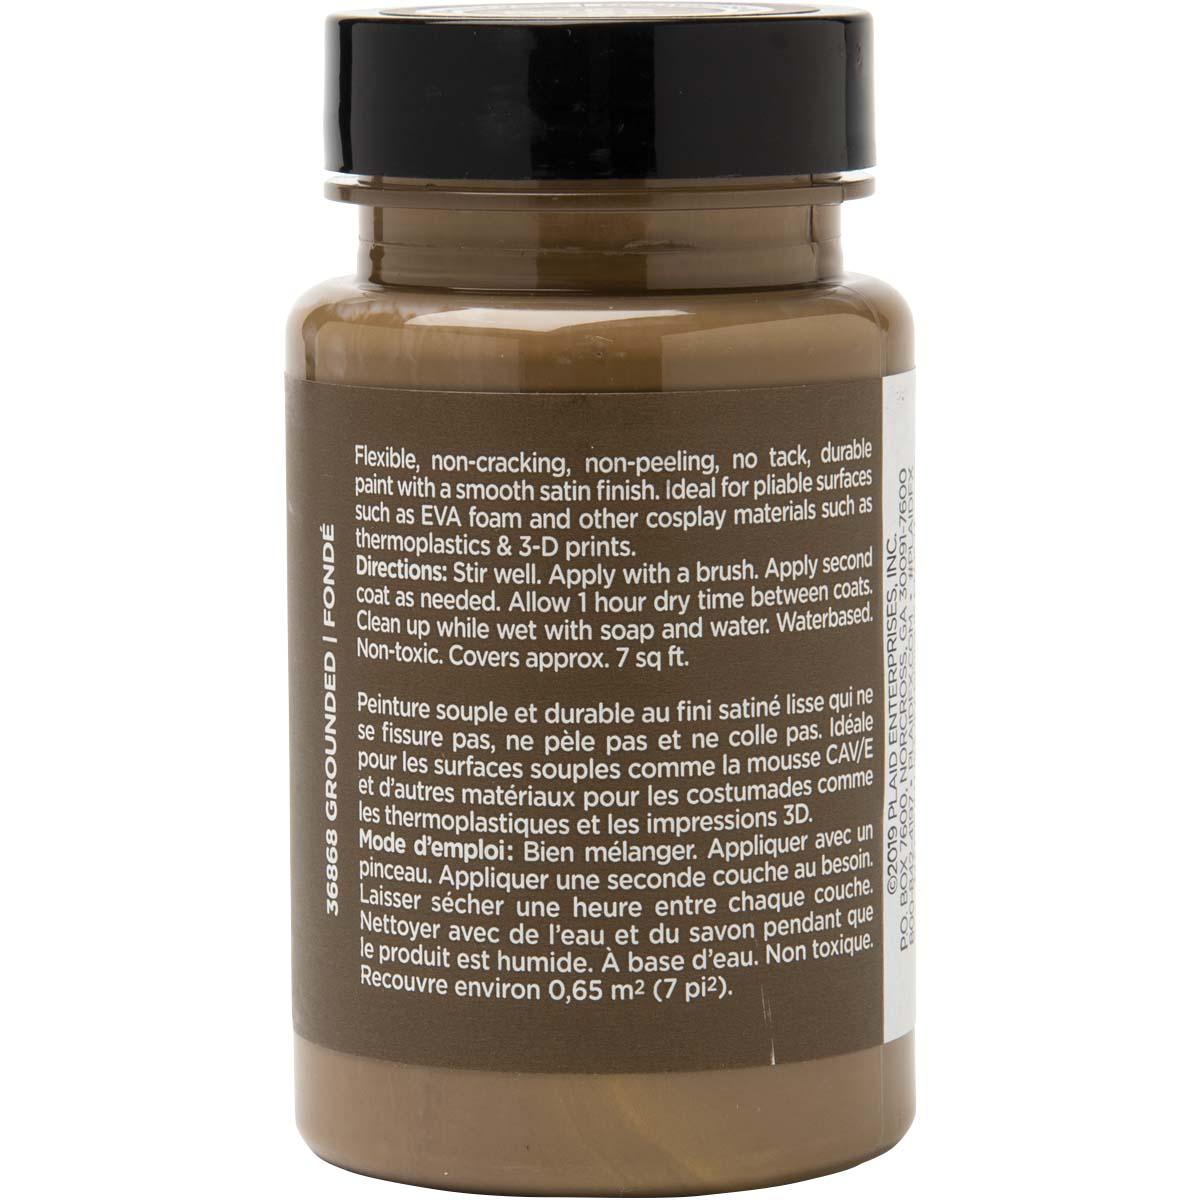 PlaidFX Smooth Satin Flexible Acrylic Paint - Grounded, 3 oz. - 36868